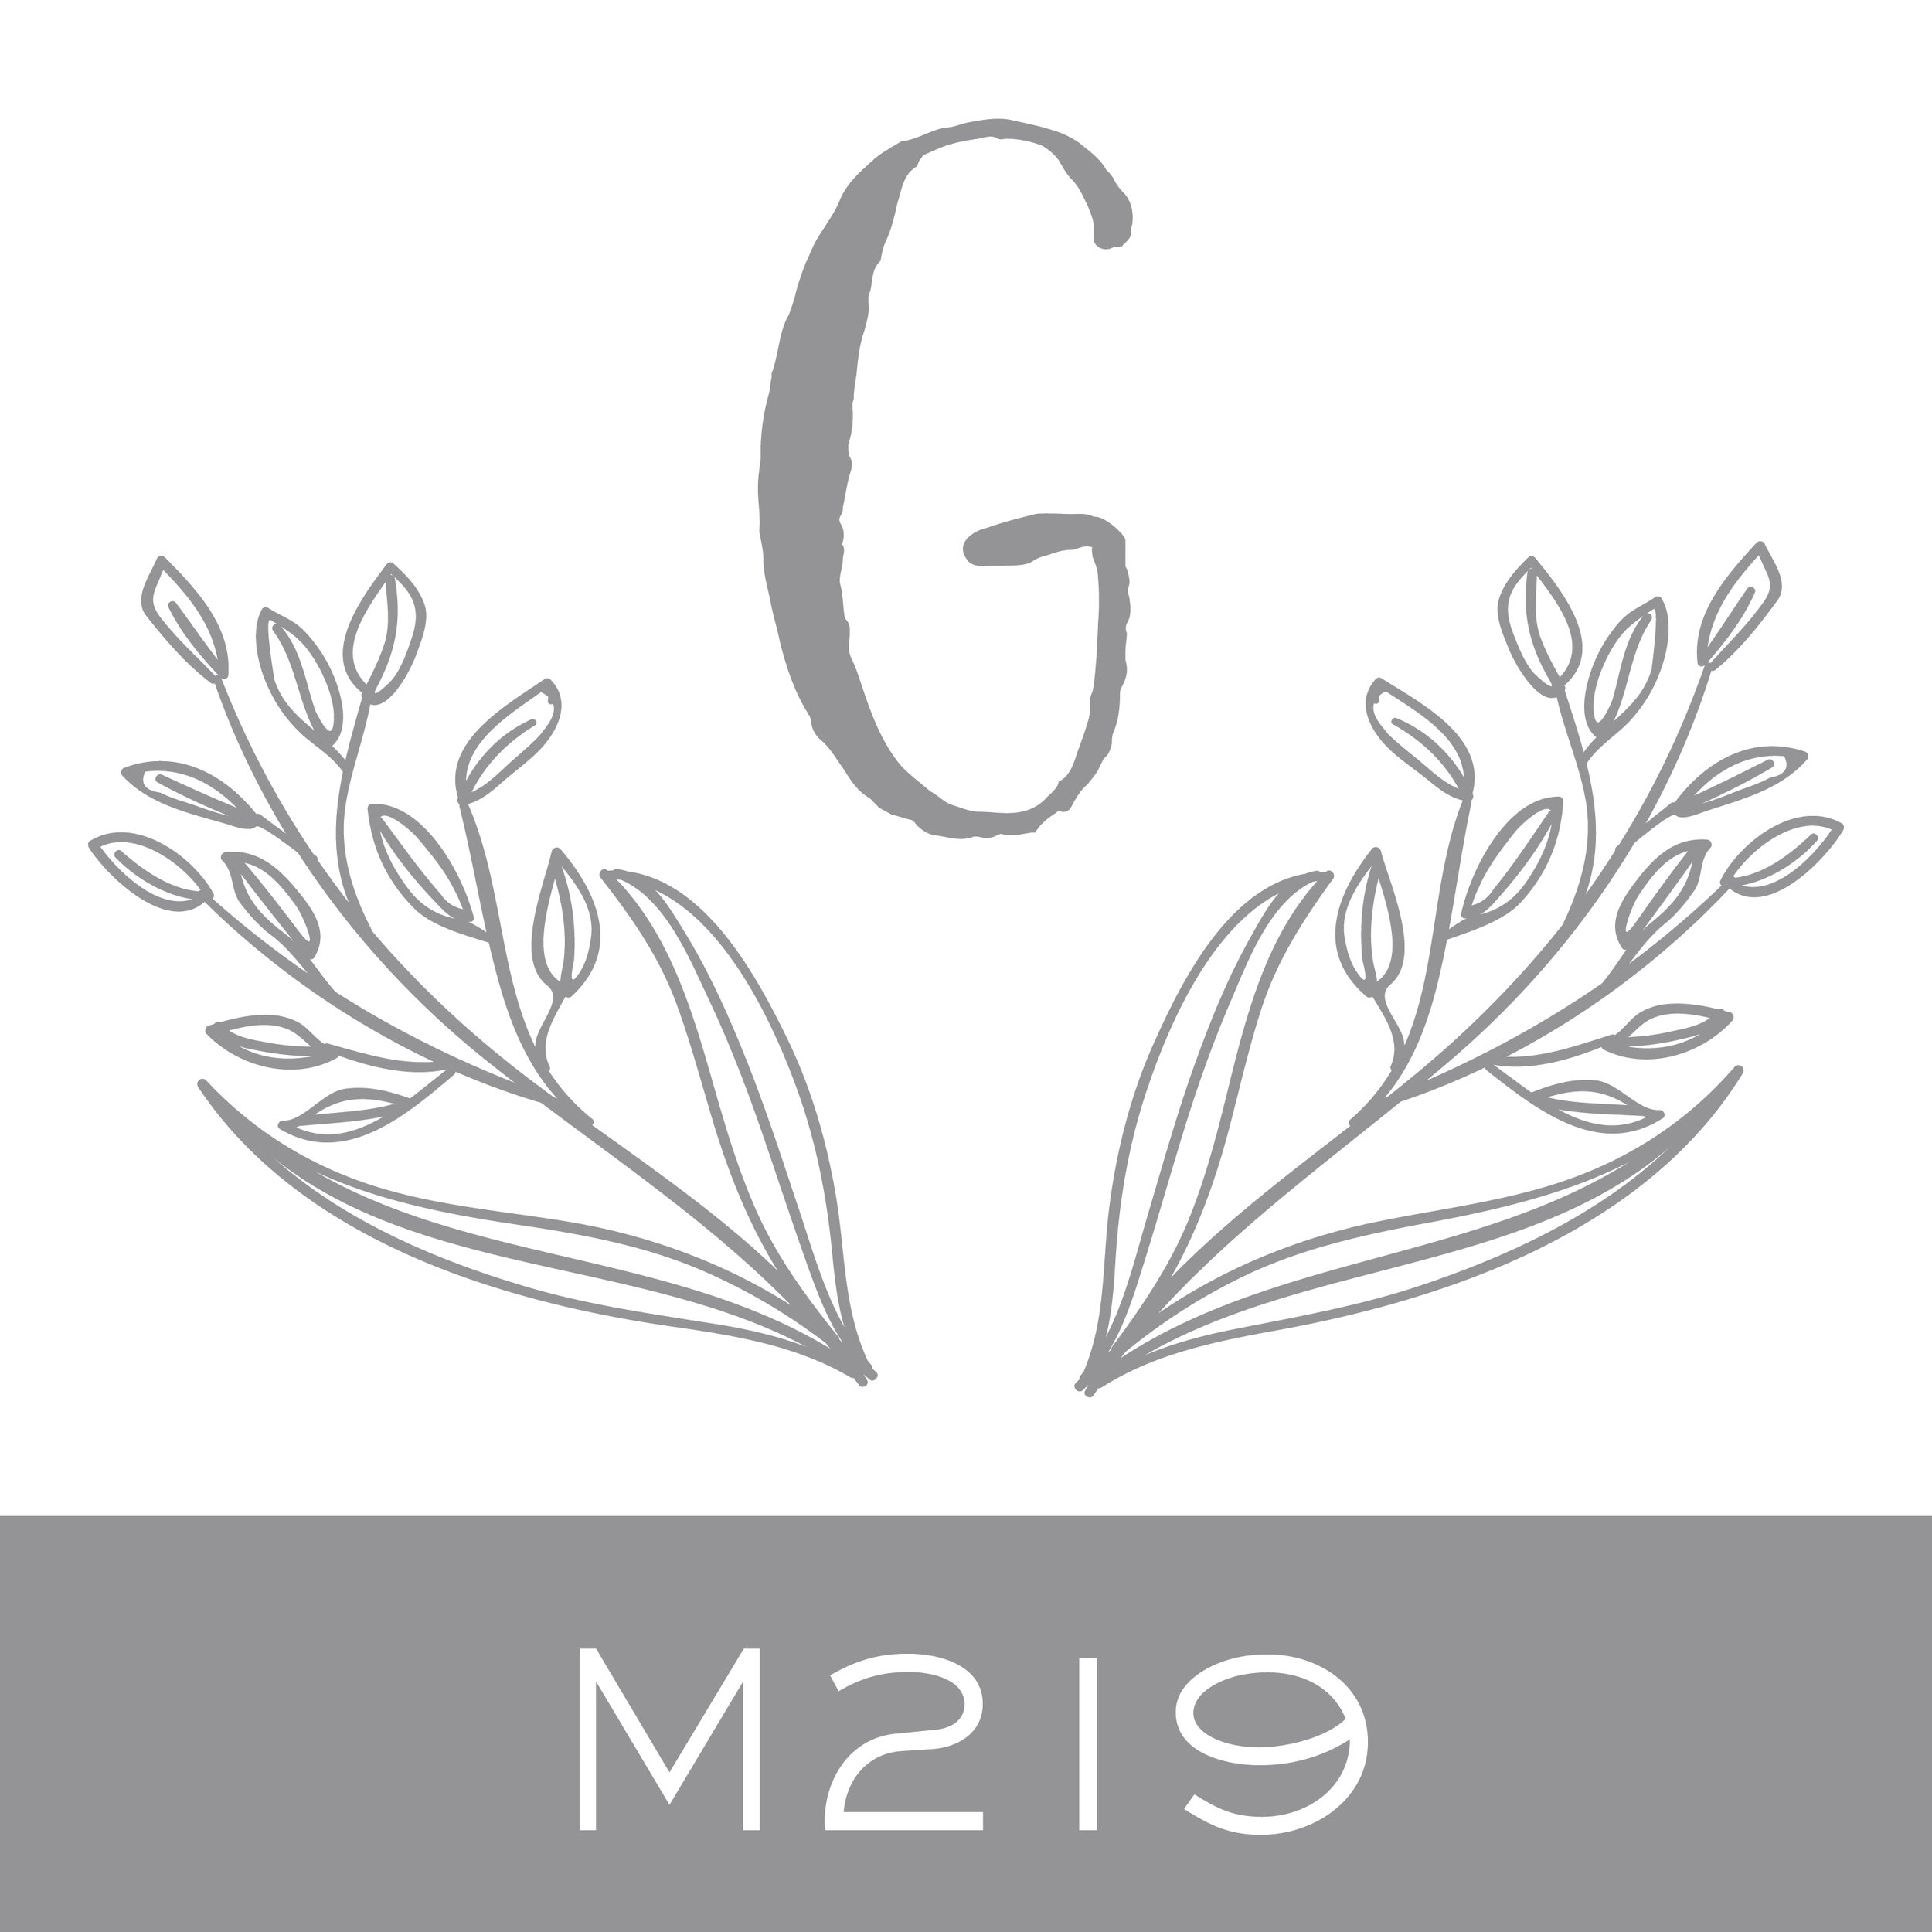 M219.jpg